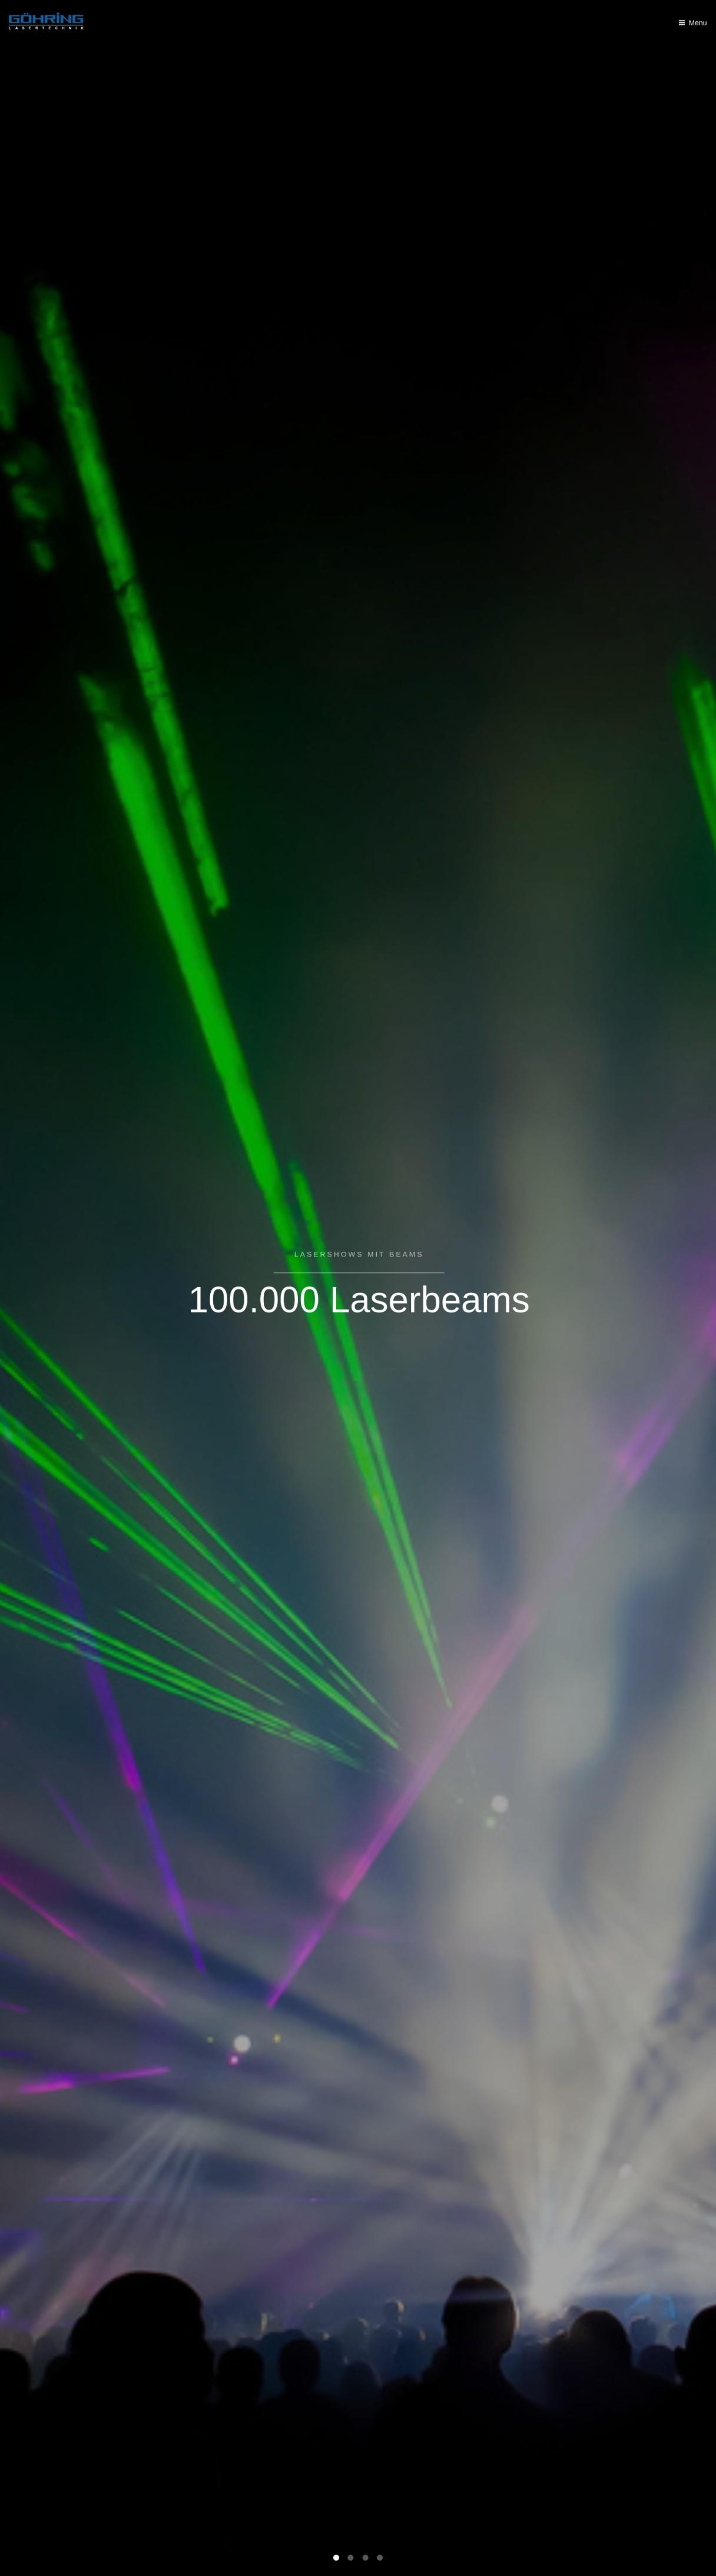 Göhring Lasertechnik - Lasersysteme, Lasershows, Pyrotechnik, Feuerwerk